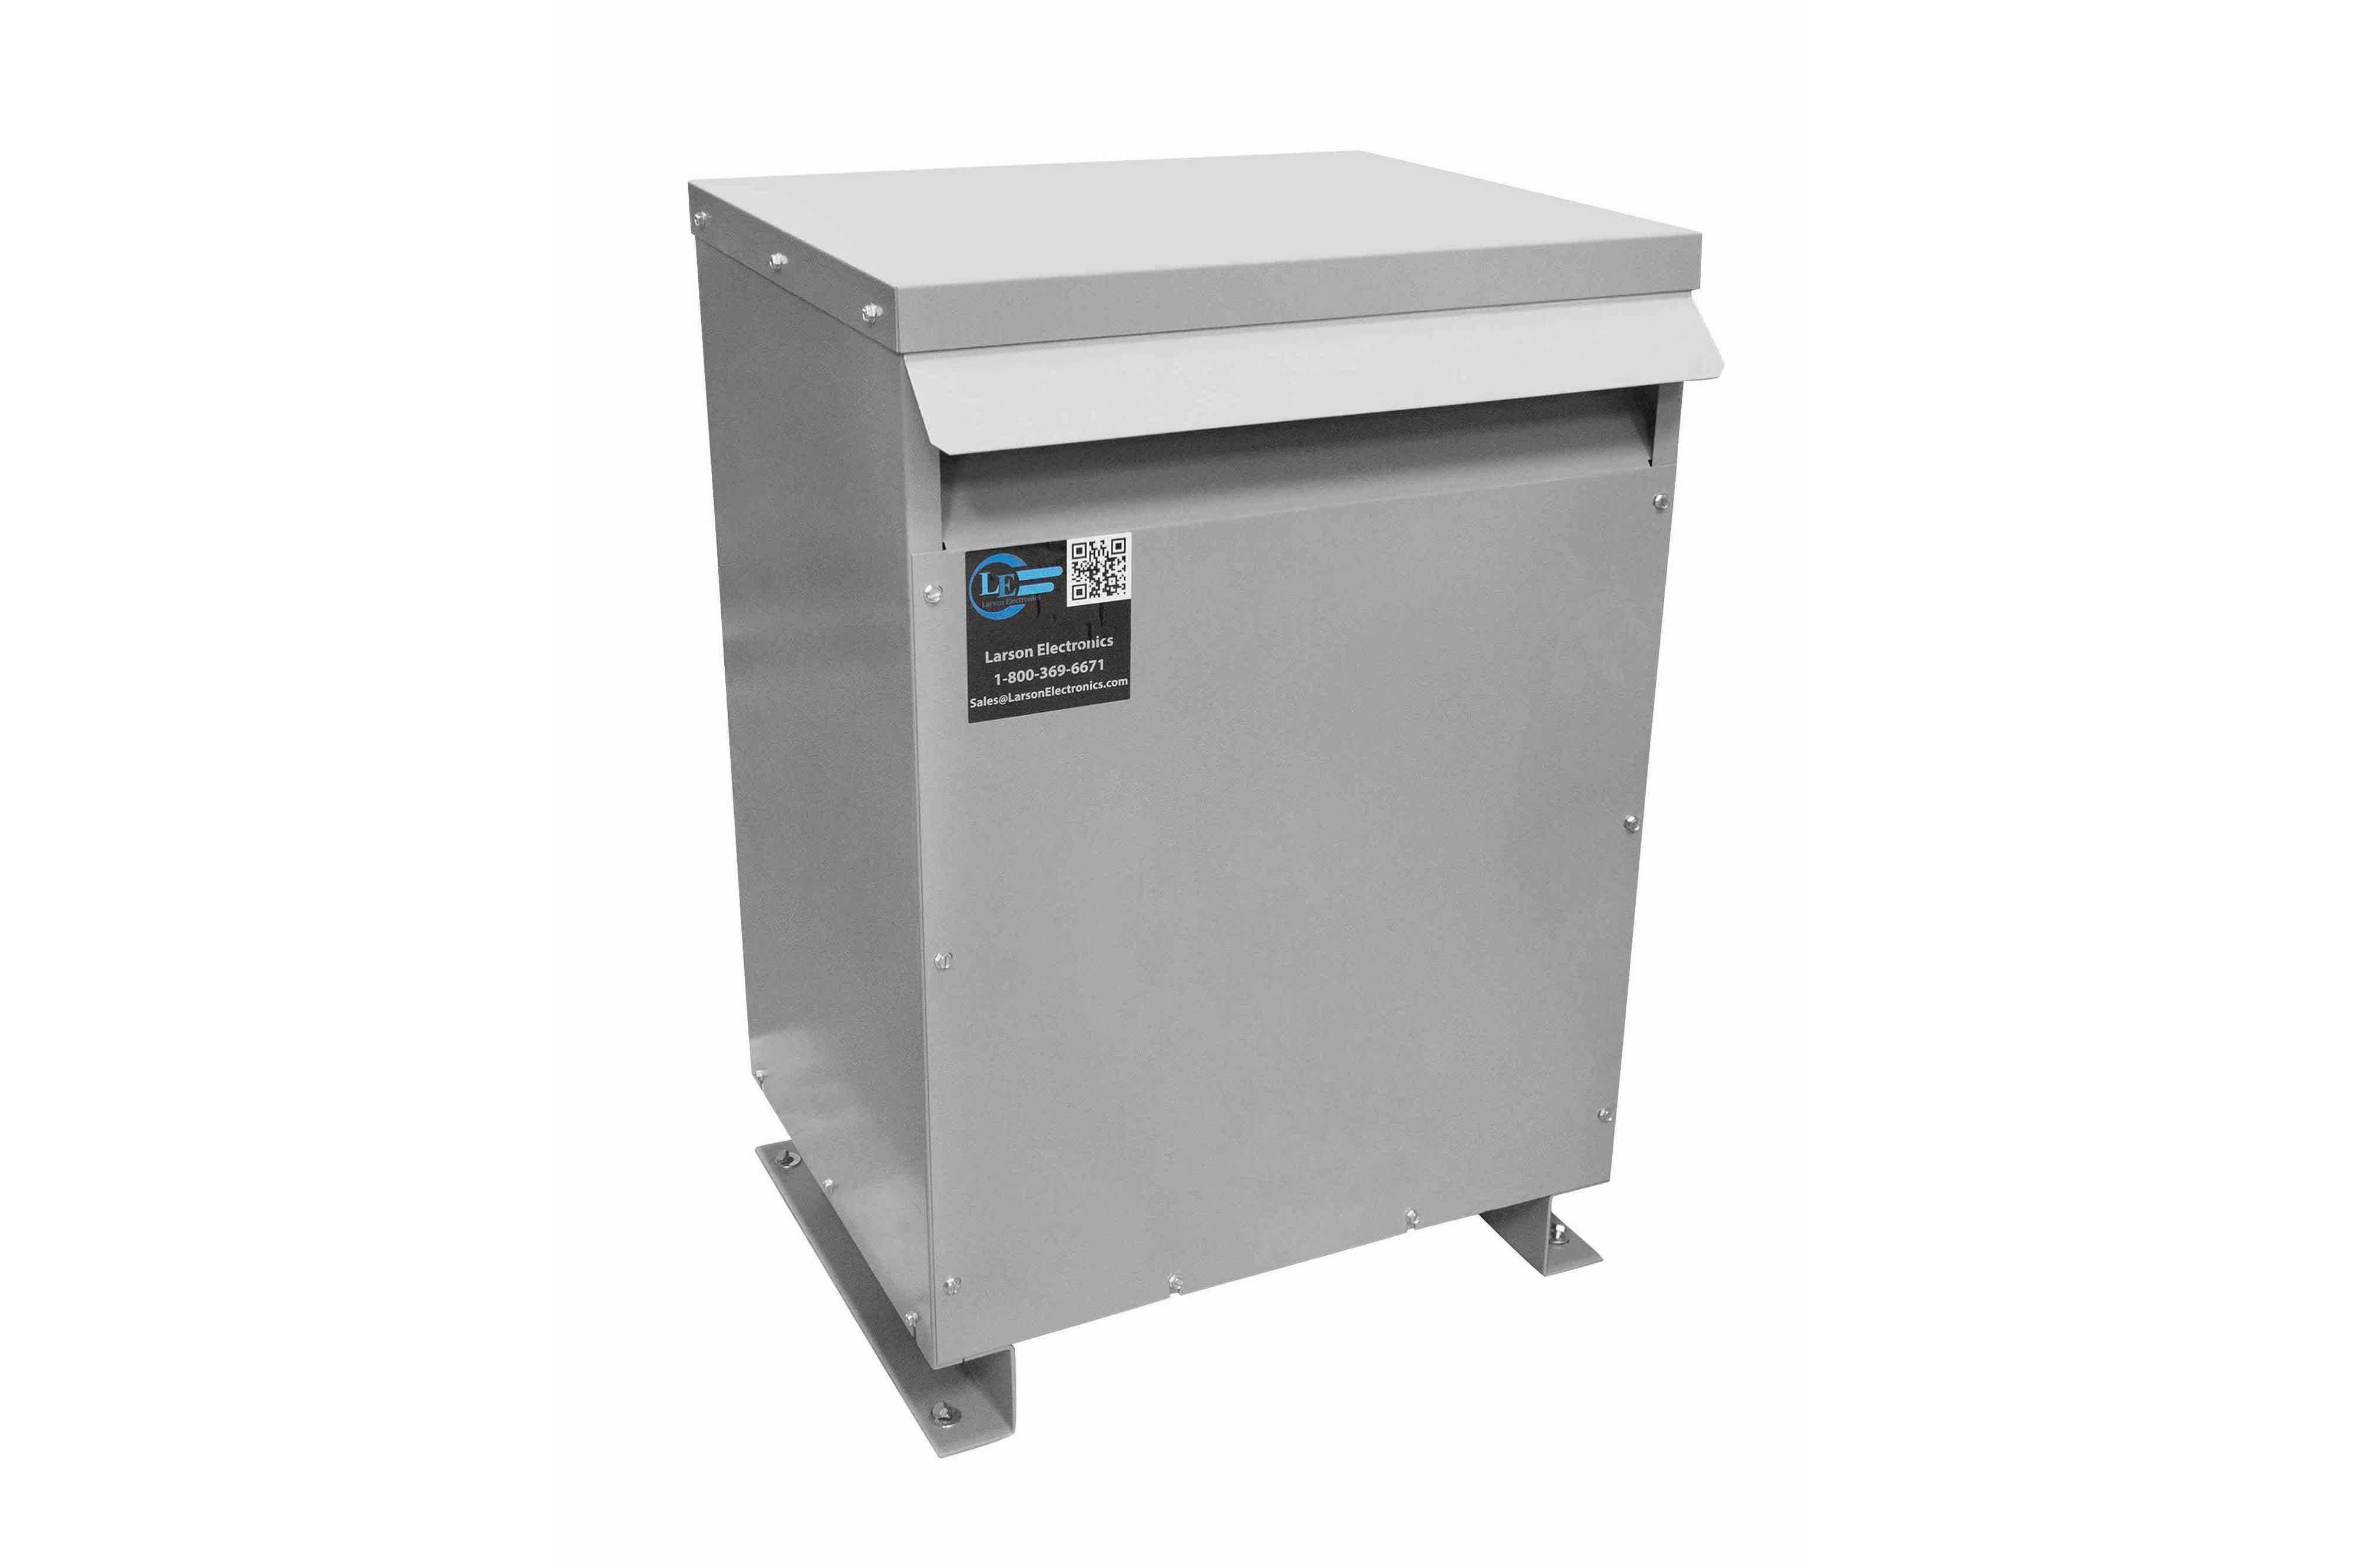 35 kVA 3PH Isolation Transformer, 600V Wye Primary, 480V Delta Secondary, N3R, Ventilated, 60 Hz